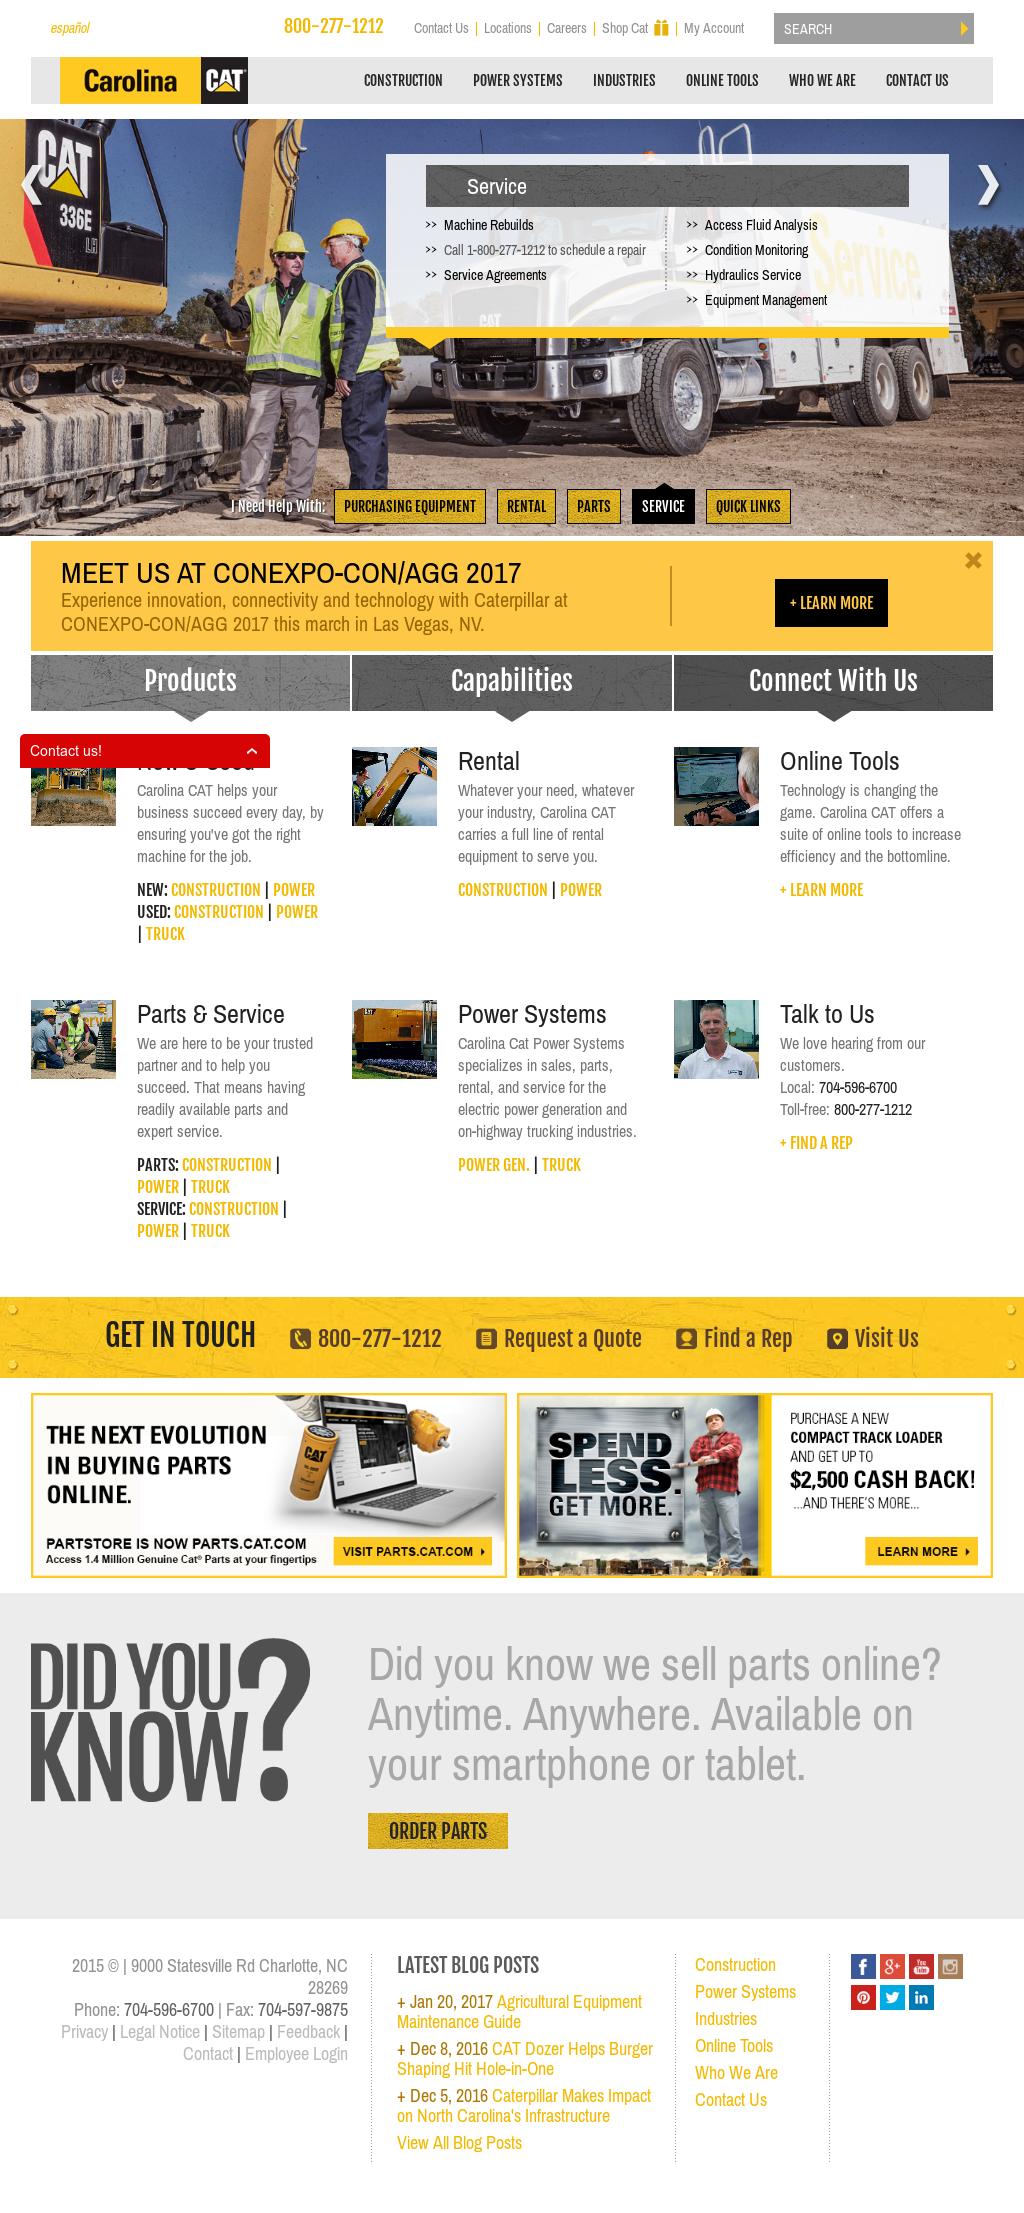 Carolina CAT Competitors, Revenue and Employees - Owler Company Profile